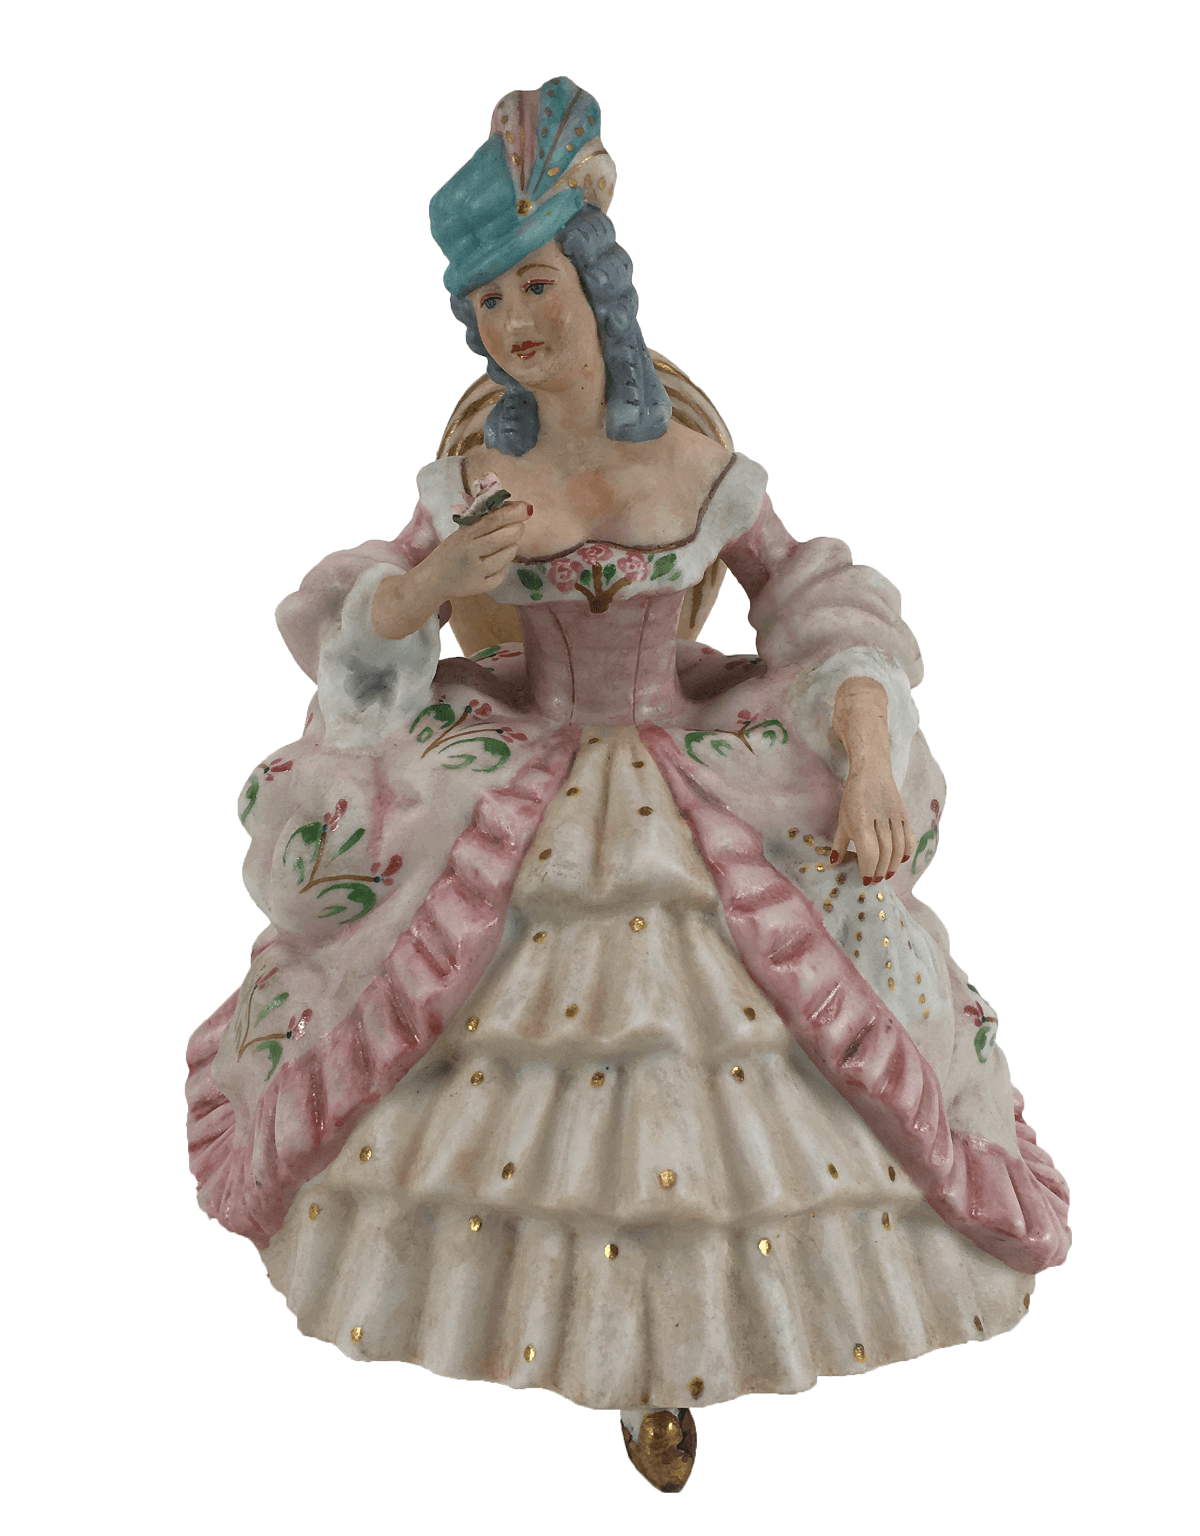 Antiga Escultura Dama Em Porcelana Biscuit 17cm Altura